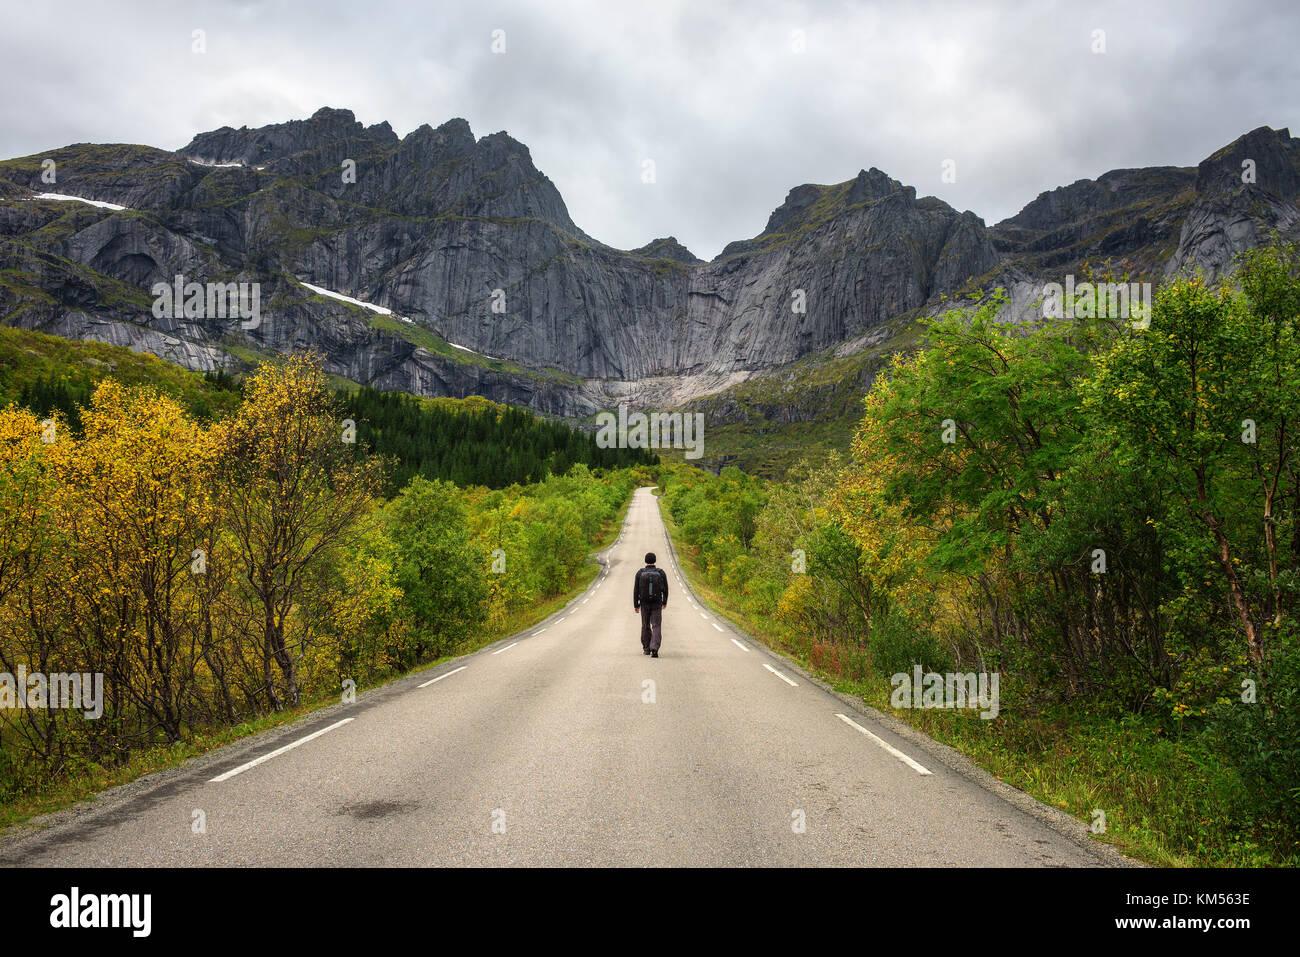 Hiker walks on a scenic road on Lofoten islands in Norway - Stock Image